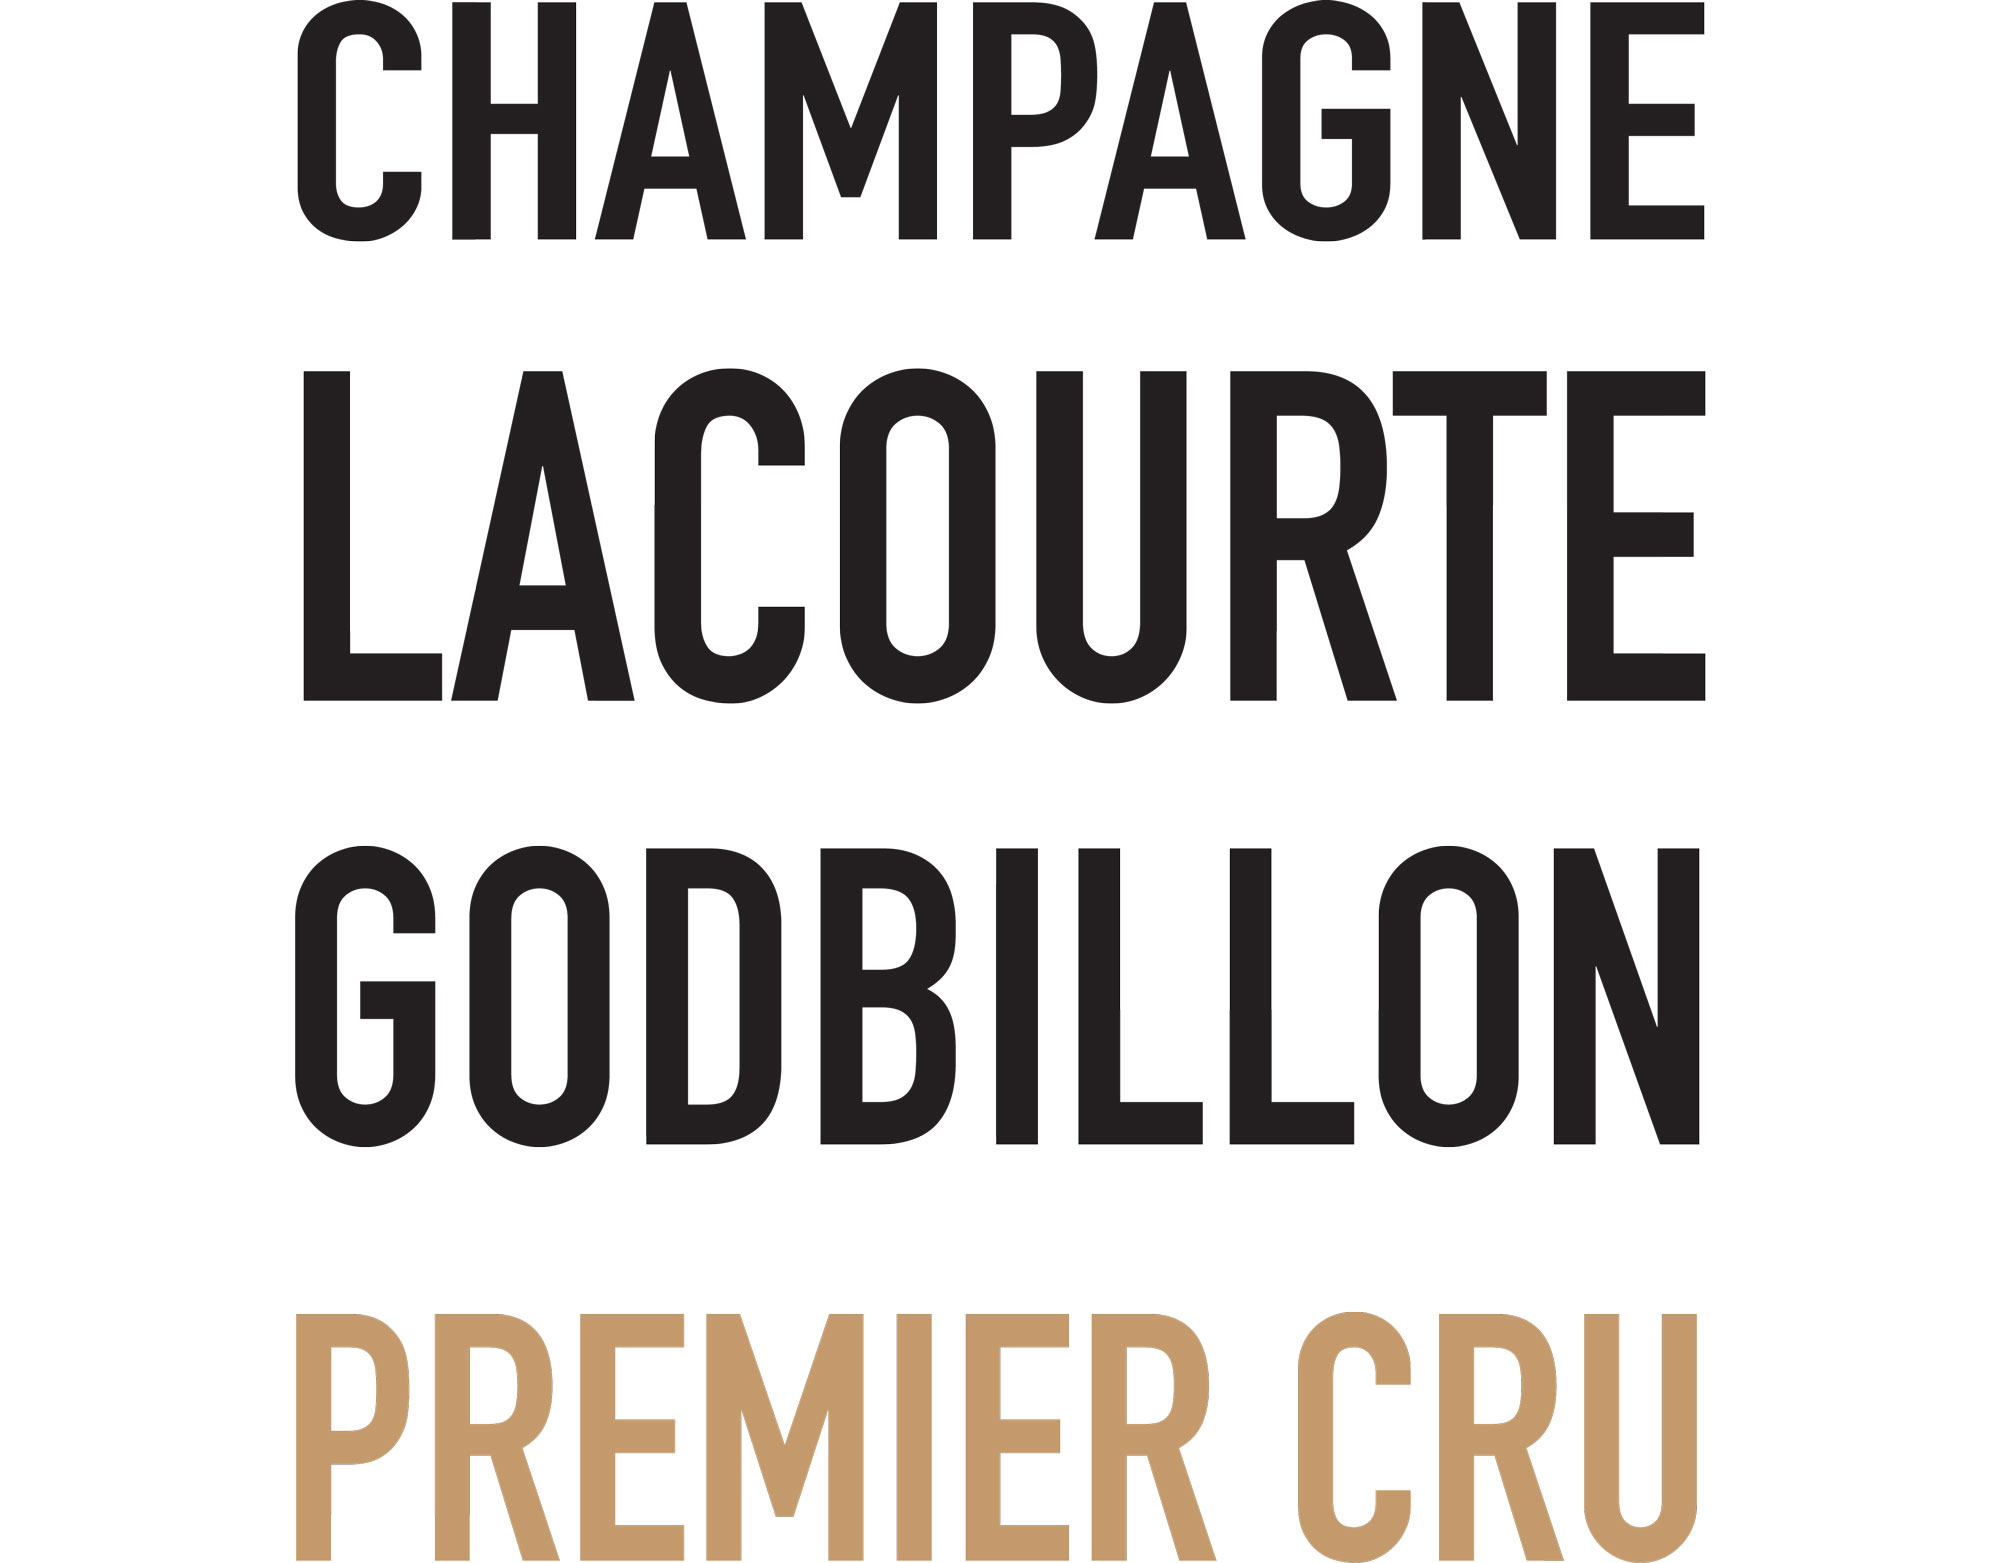 Lacourte-Godbillon Champagne